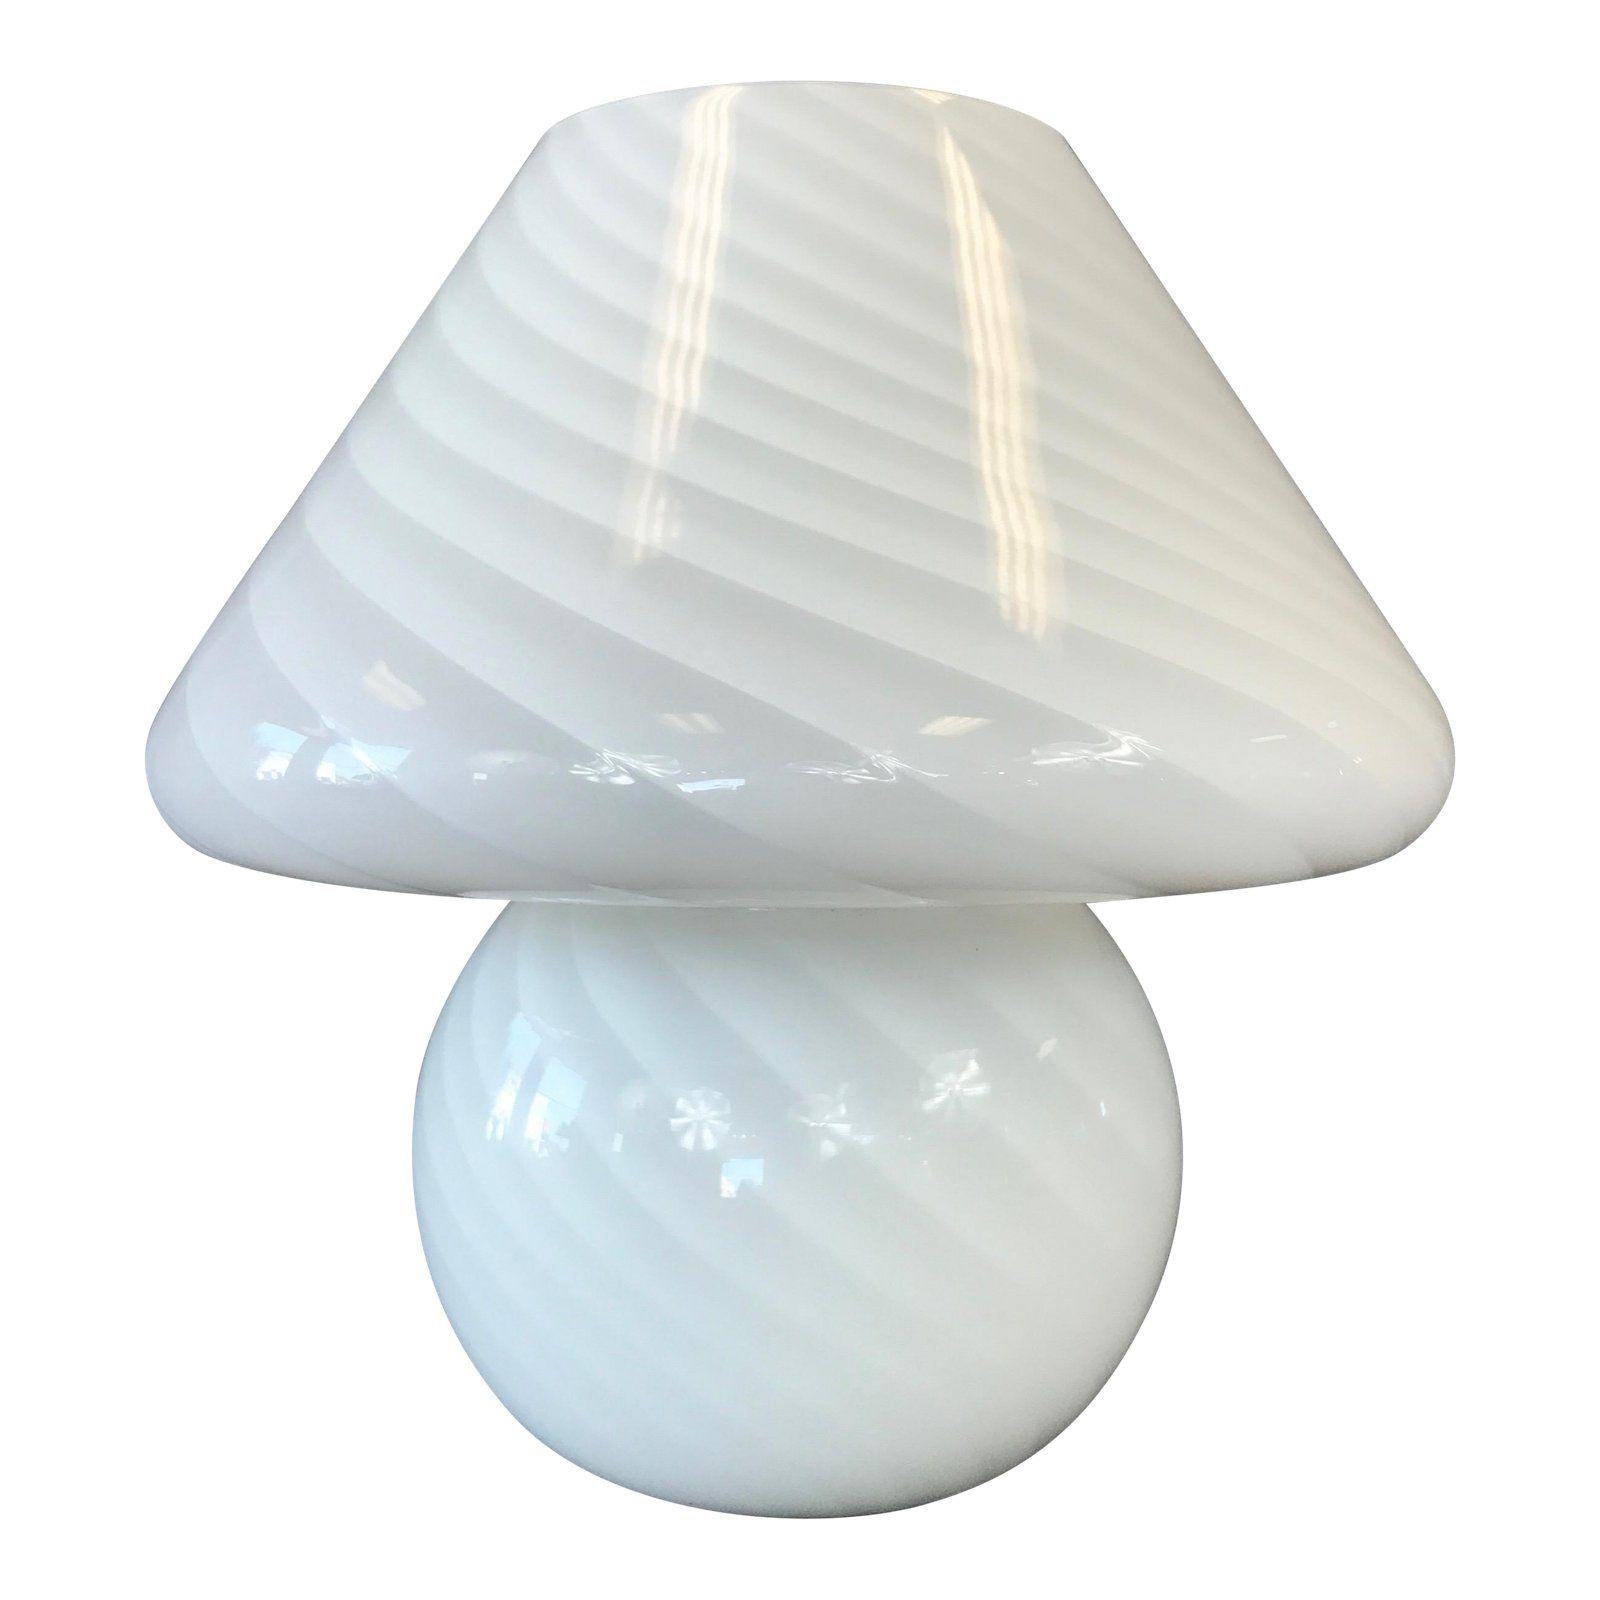 Vintage Vetri Murano Glass Mushroom Lamp Mushroom Lamp Glass Mushrooms Lamp